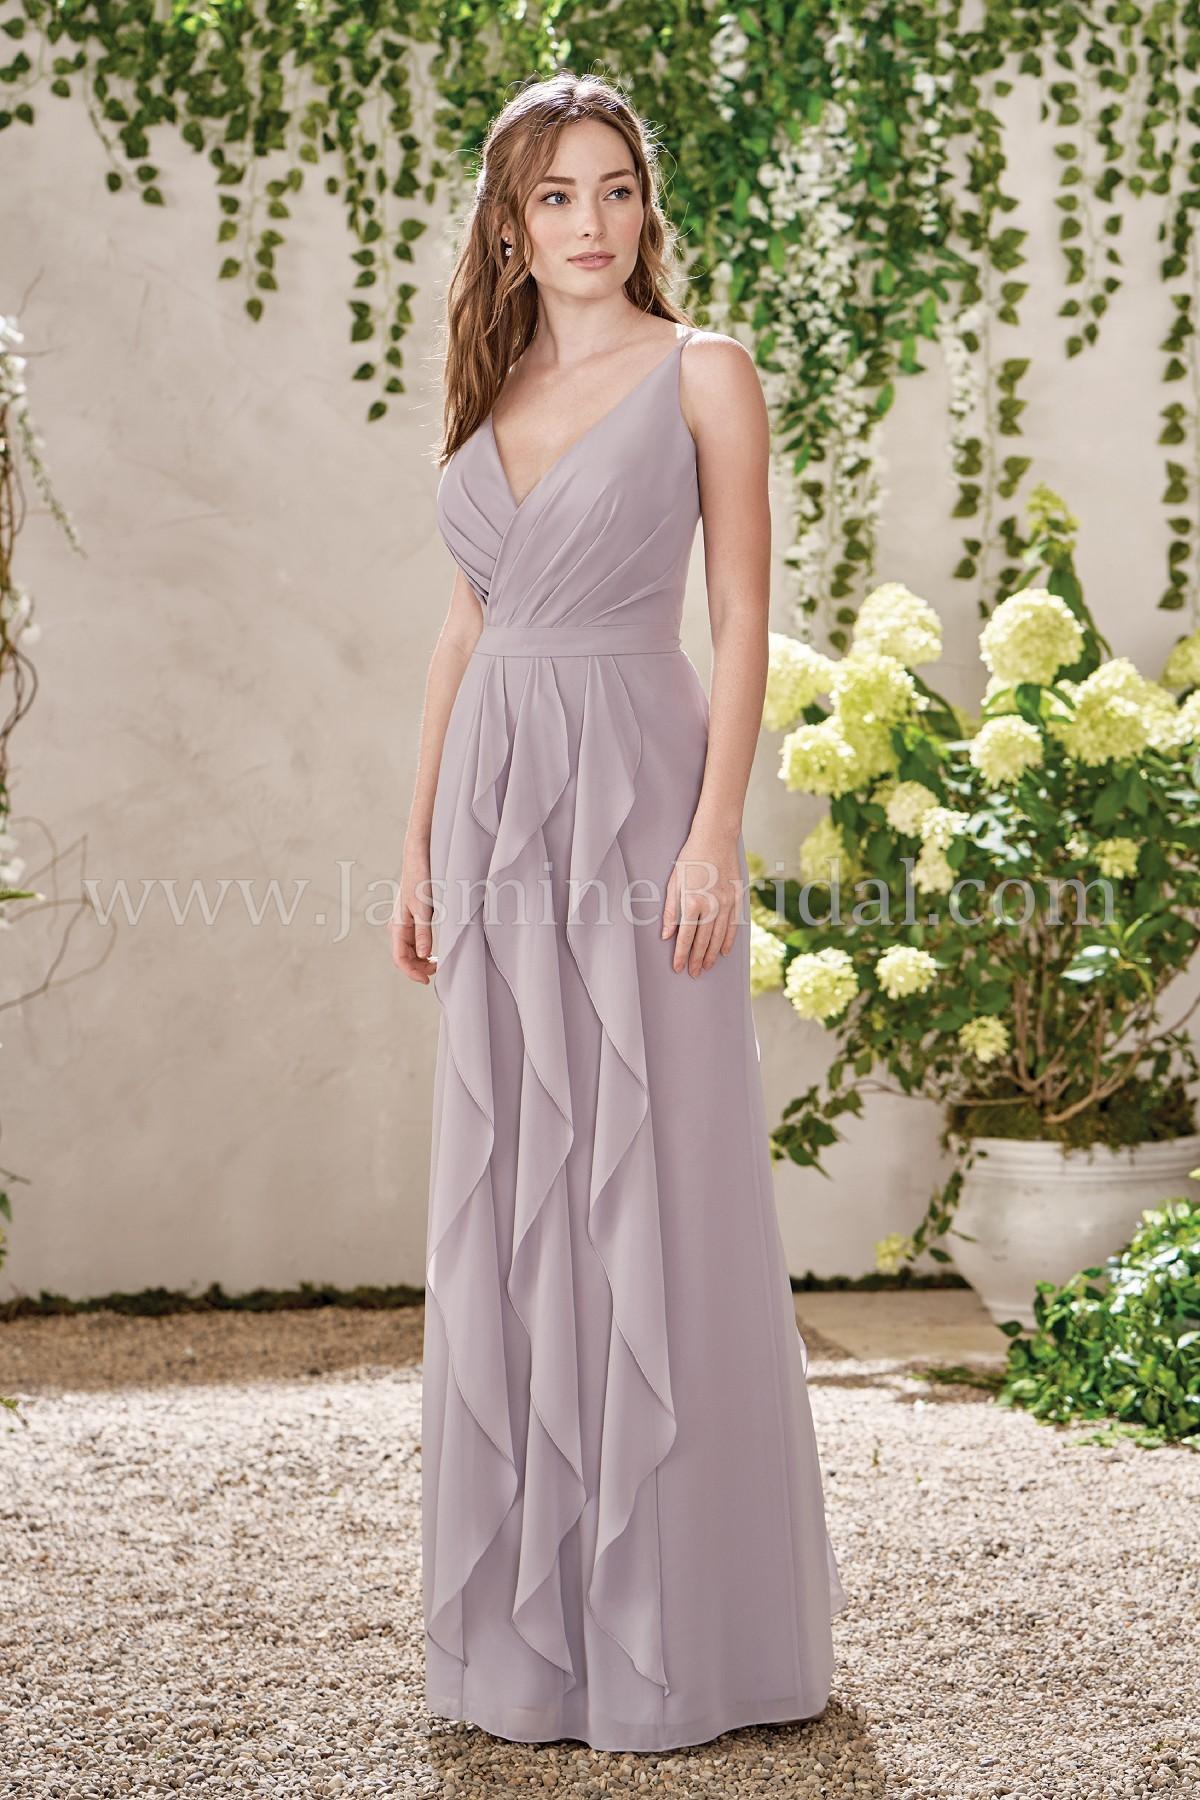 6251746aea3 B193015 Long V-neck Poly Chiffon Ruffled Bridesmaid Dress